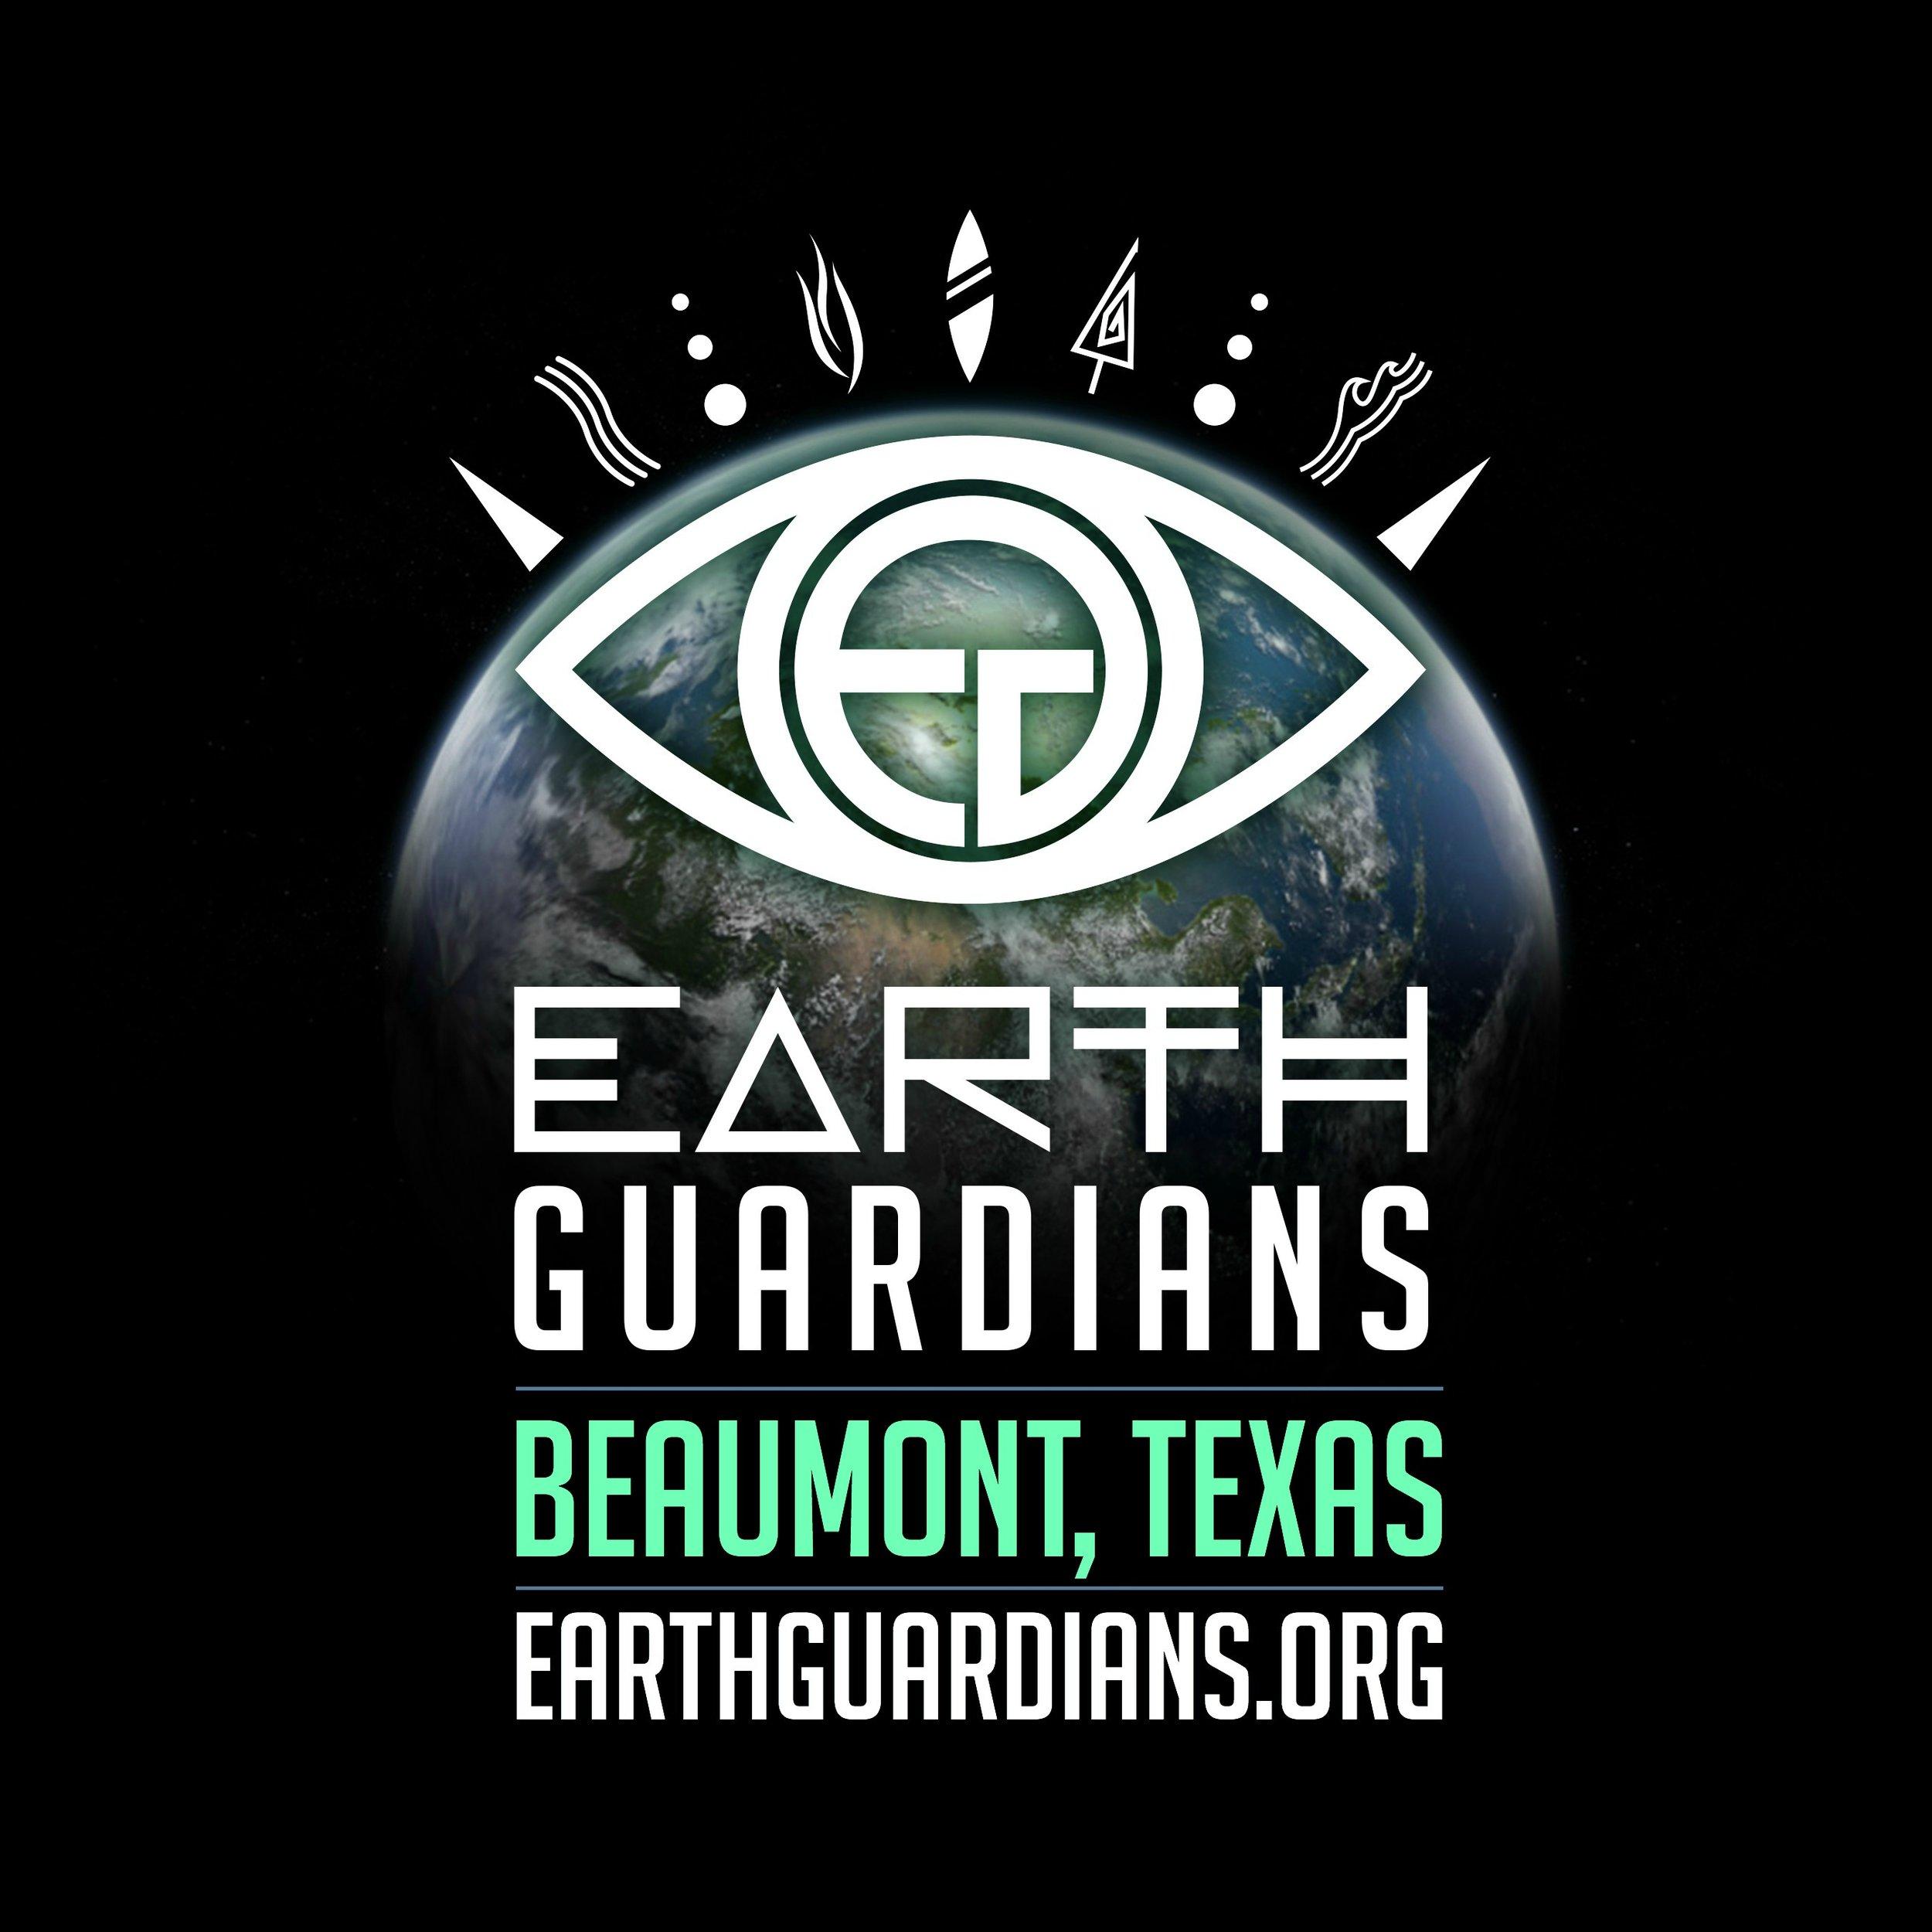 EG_crew logo beaumont correction.jpg